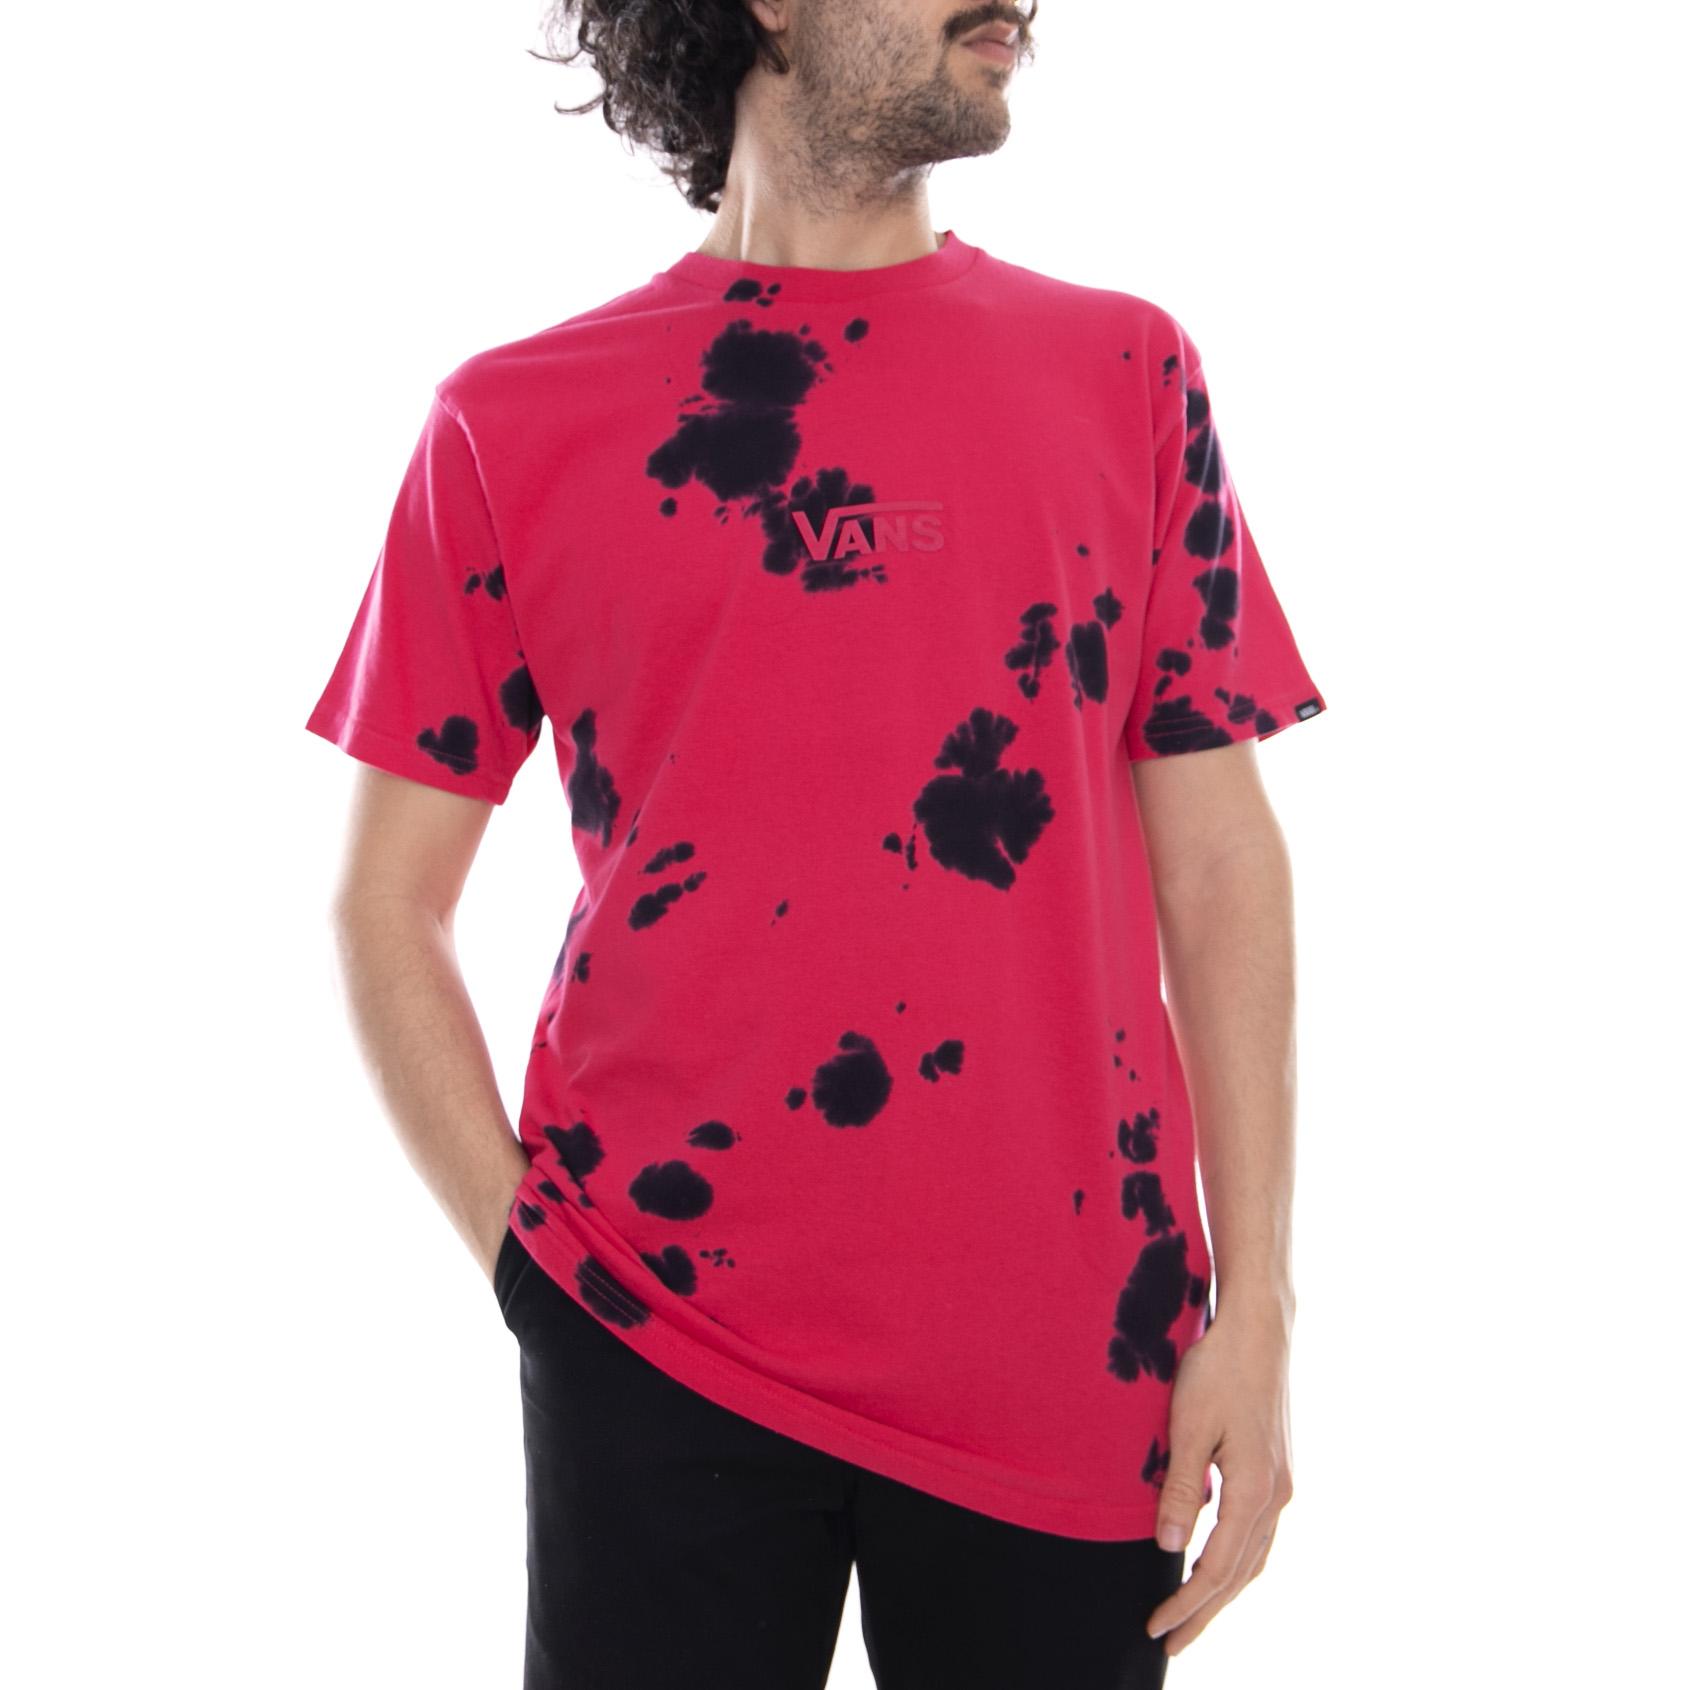 b945abb157194b Vans Mn Spot Dye Jazzy Black - T-shirt Crew-neck Man Fuchsia